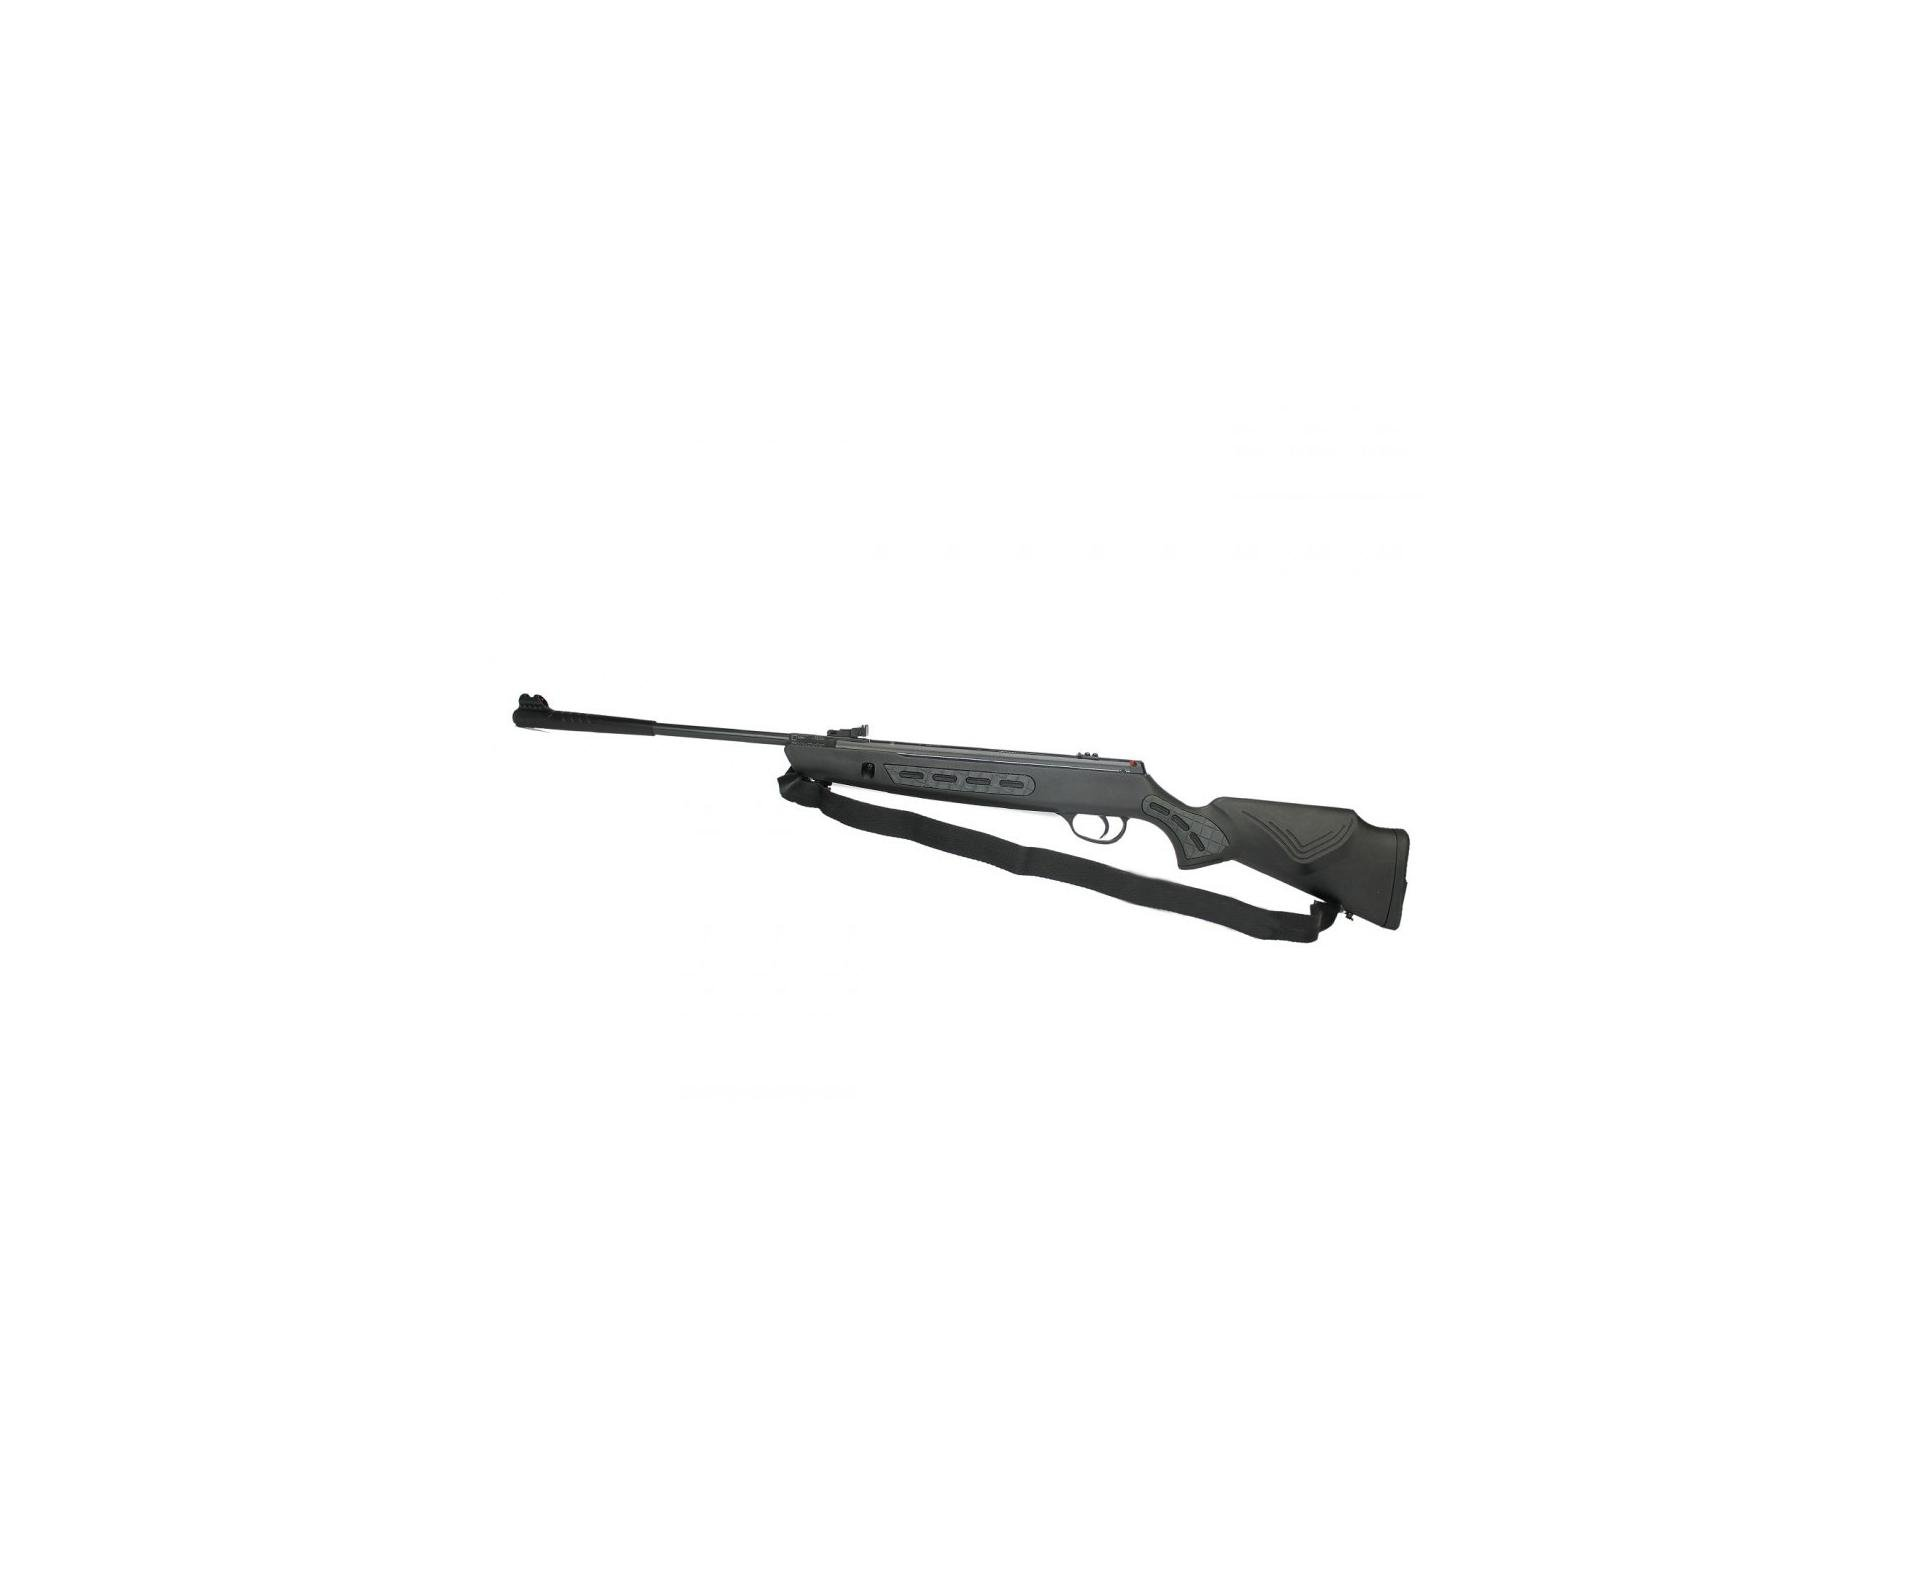 Carabina De Pressão Hatsan Striker 1000s 5,5mm - Rossi